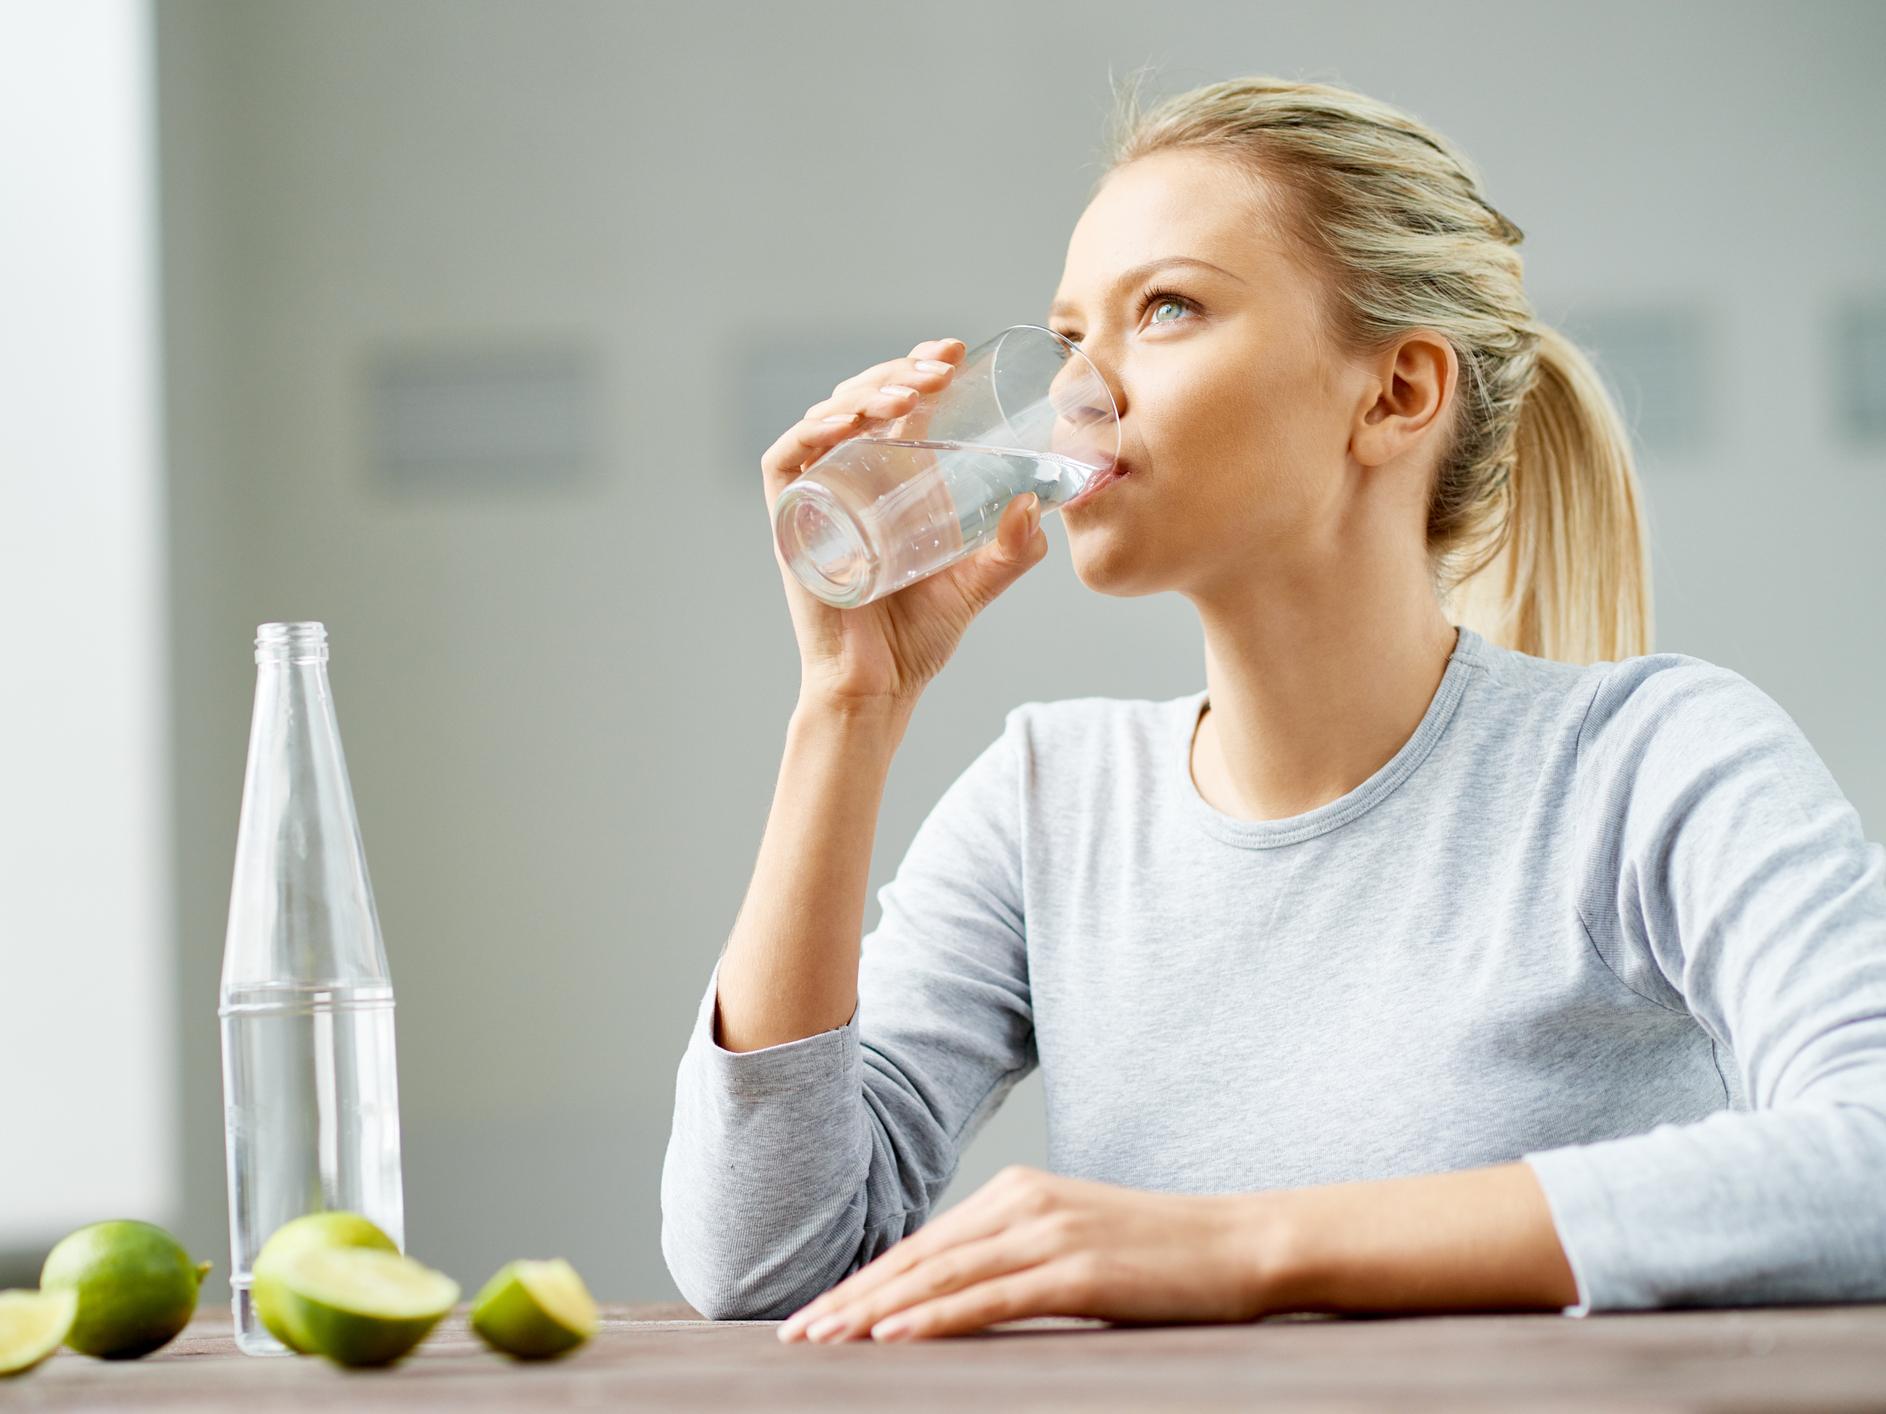 PunjabKesari, Weight loss Tips Image, वजन कैसे कम करें इमेज